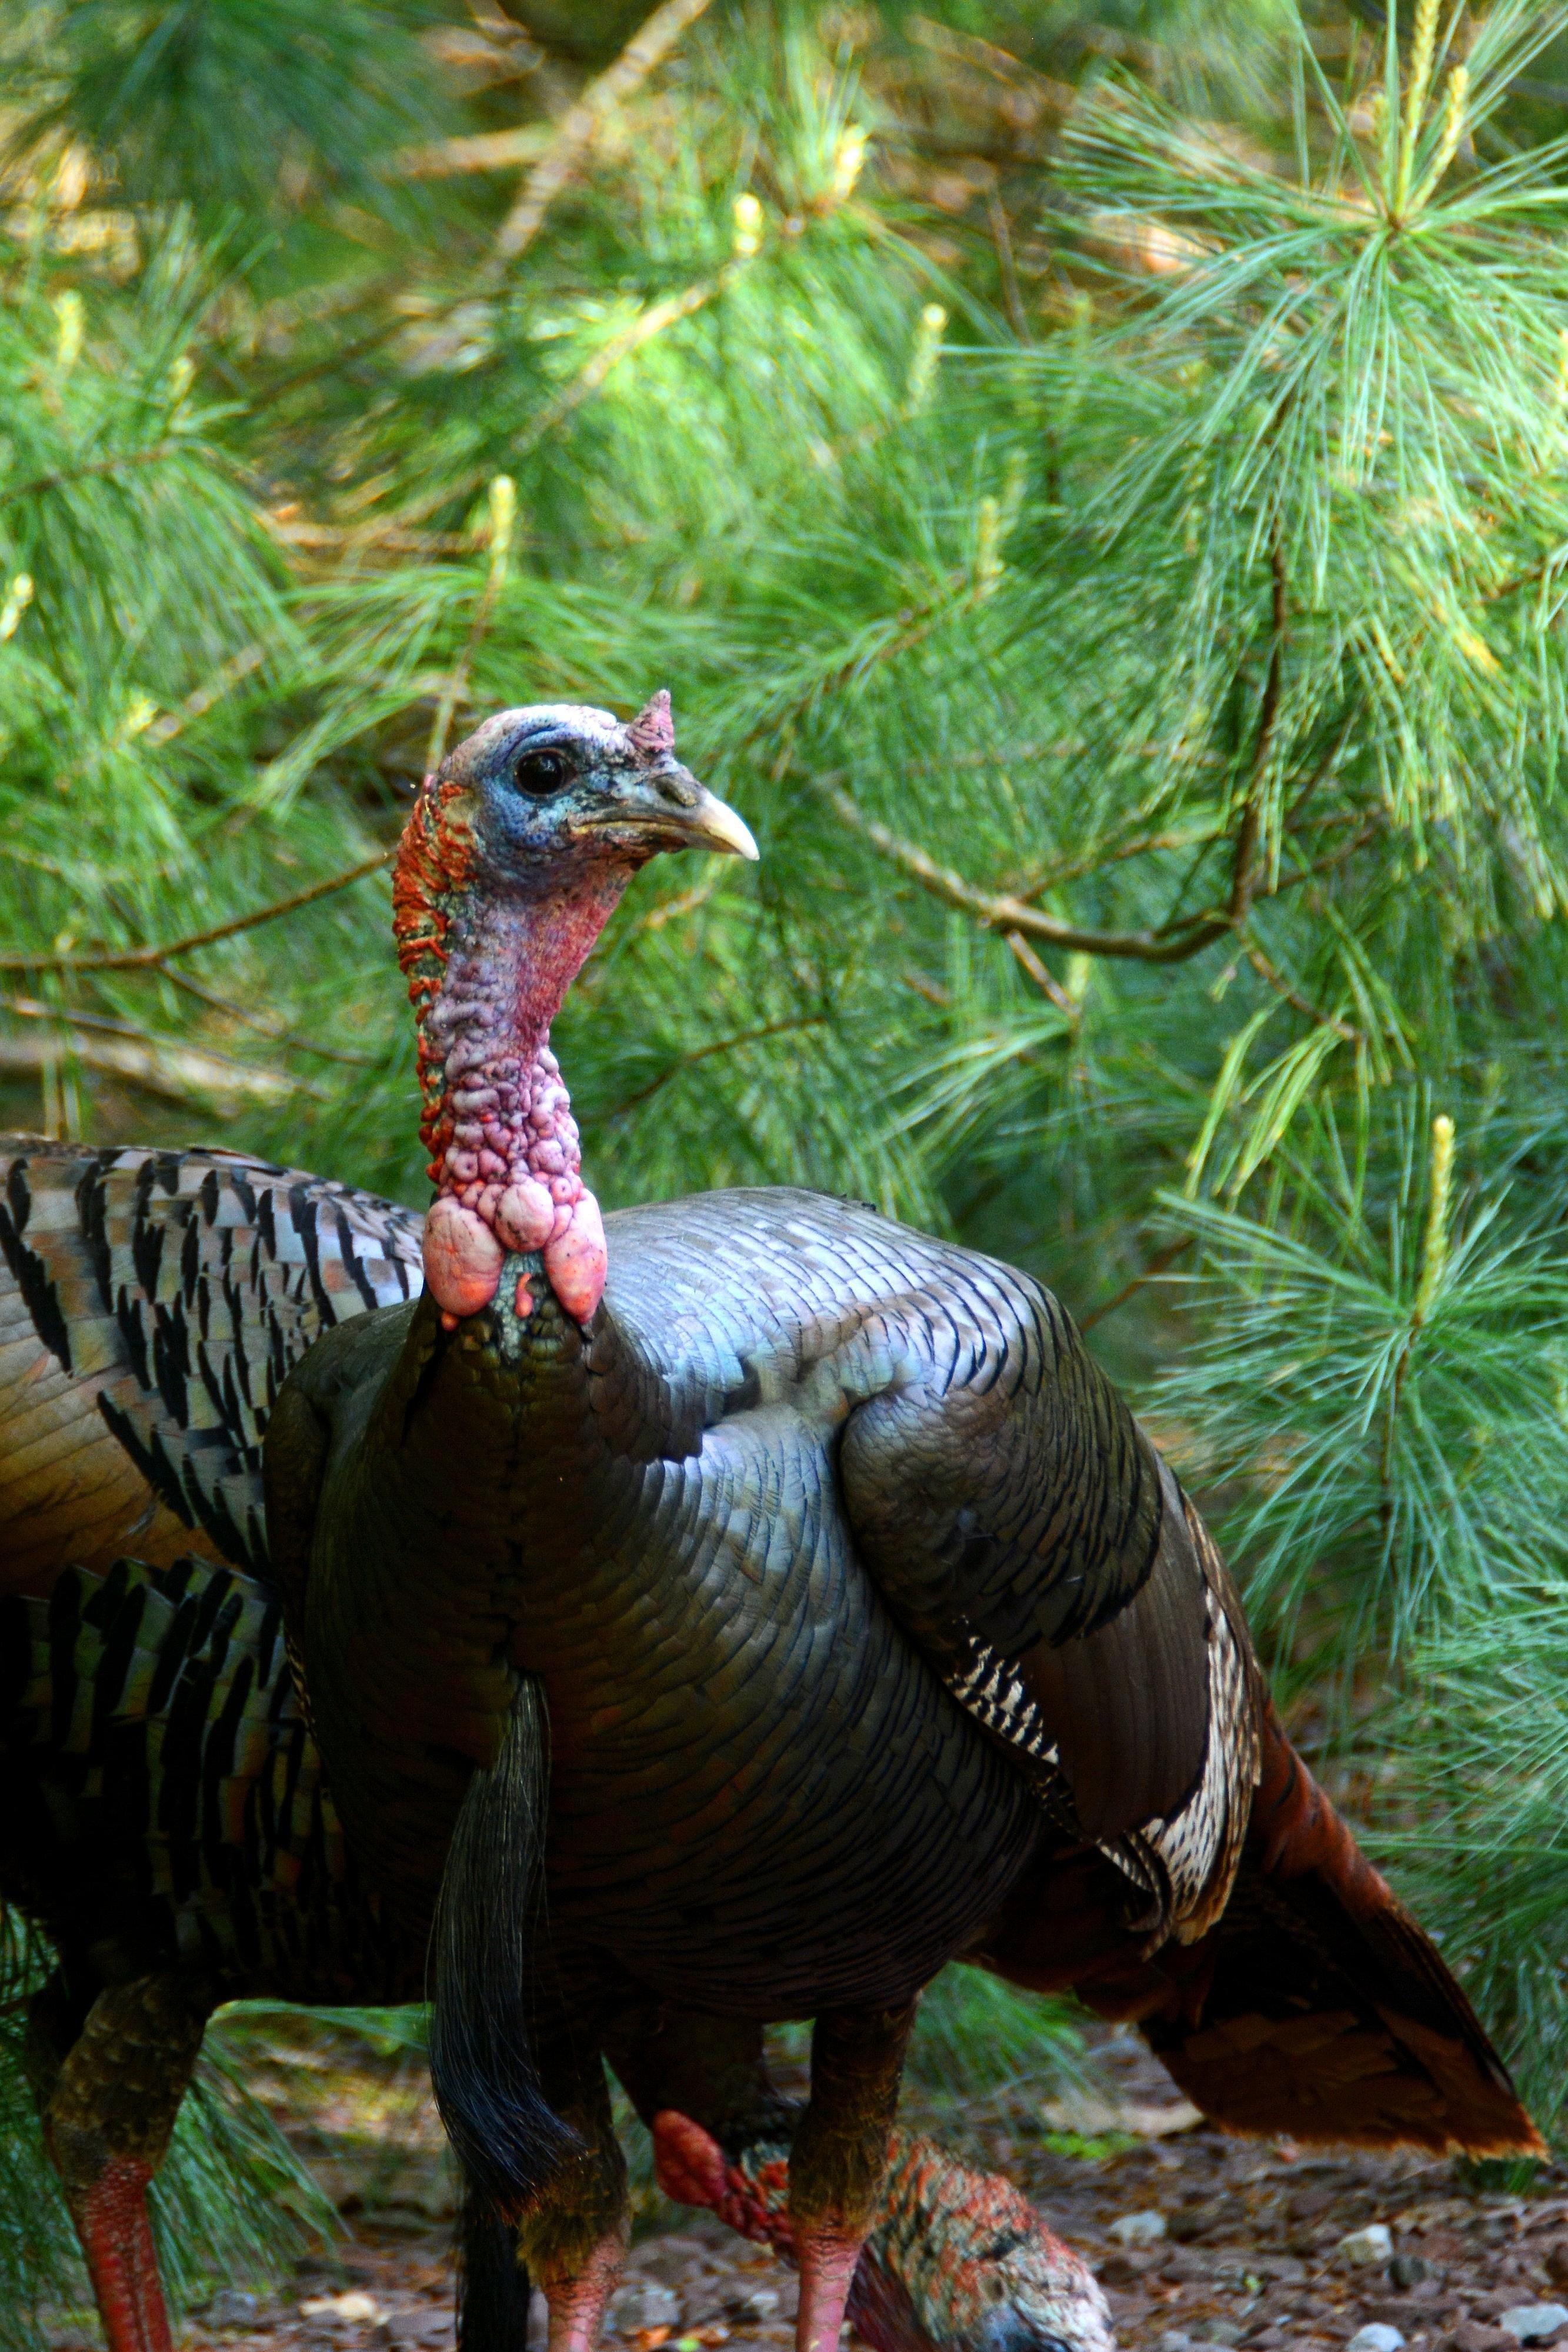 turkey trivia did you know only tom turkeys gobble